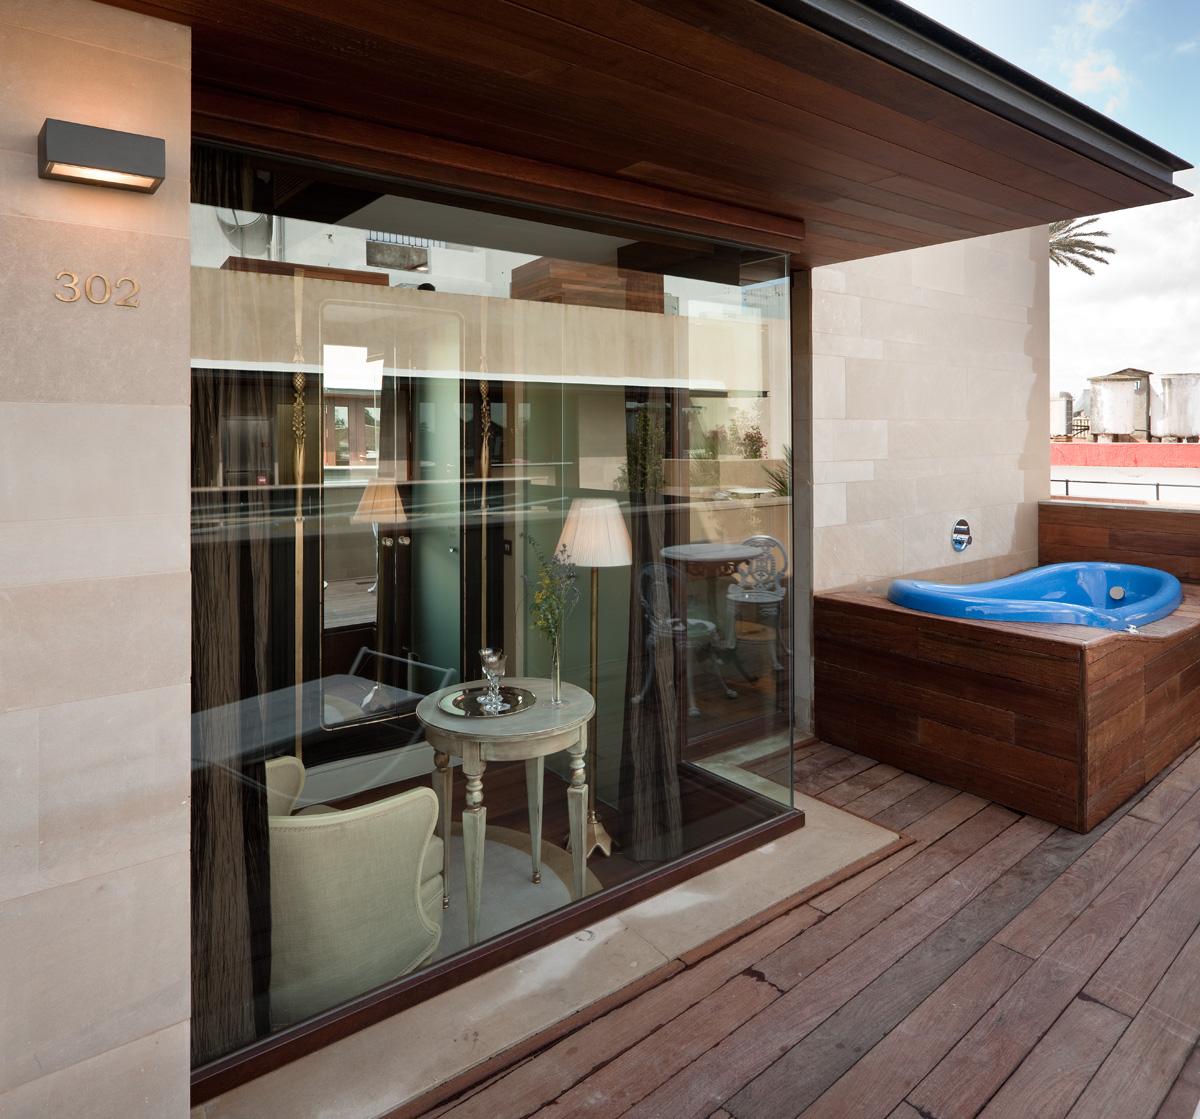 Exteriores con acabados en madera para hotel en Sevilla